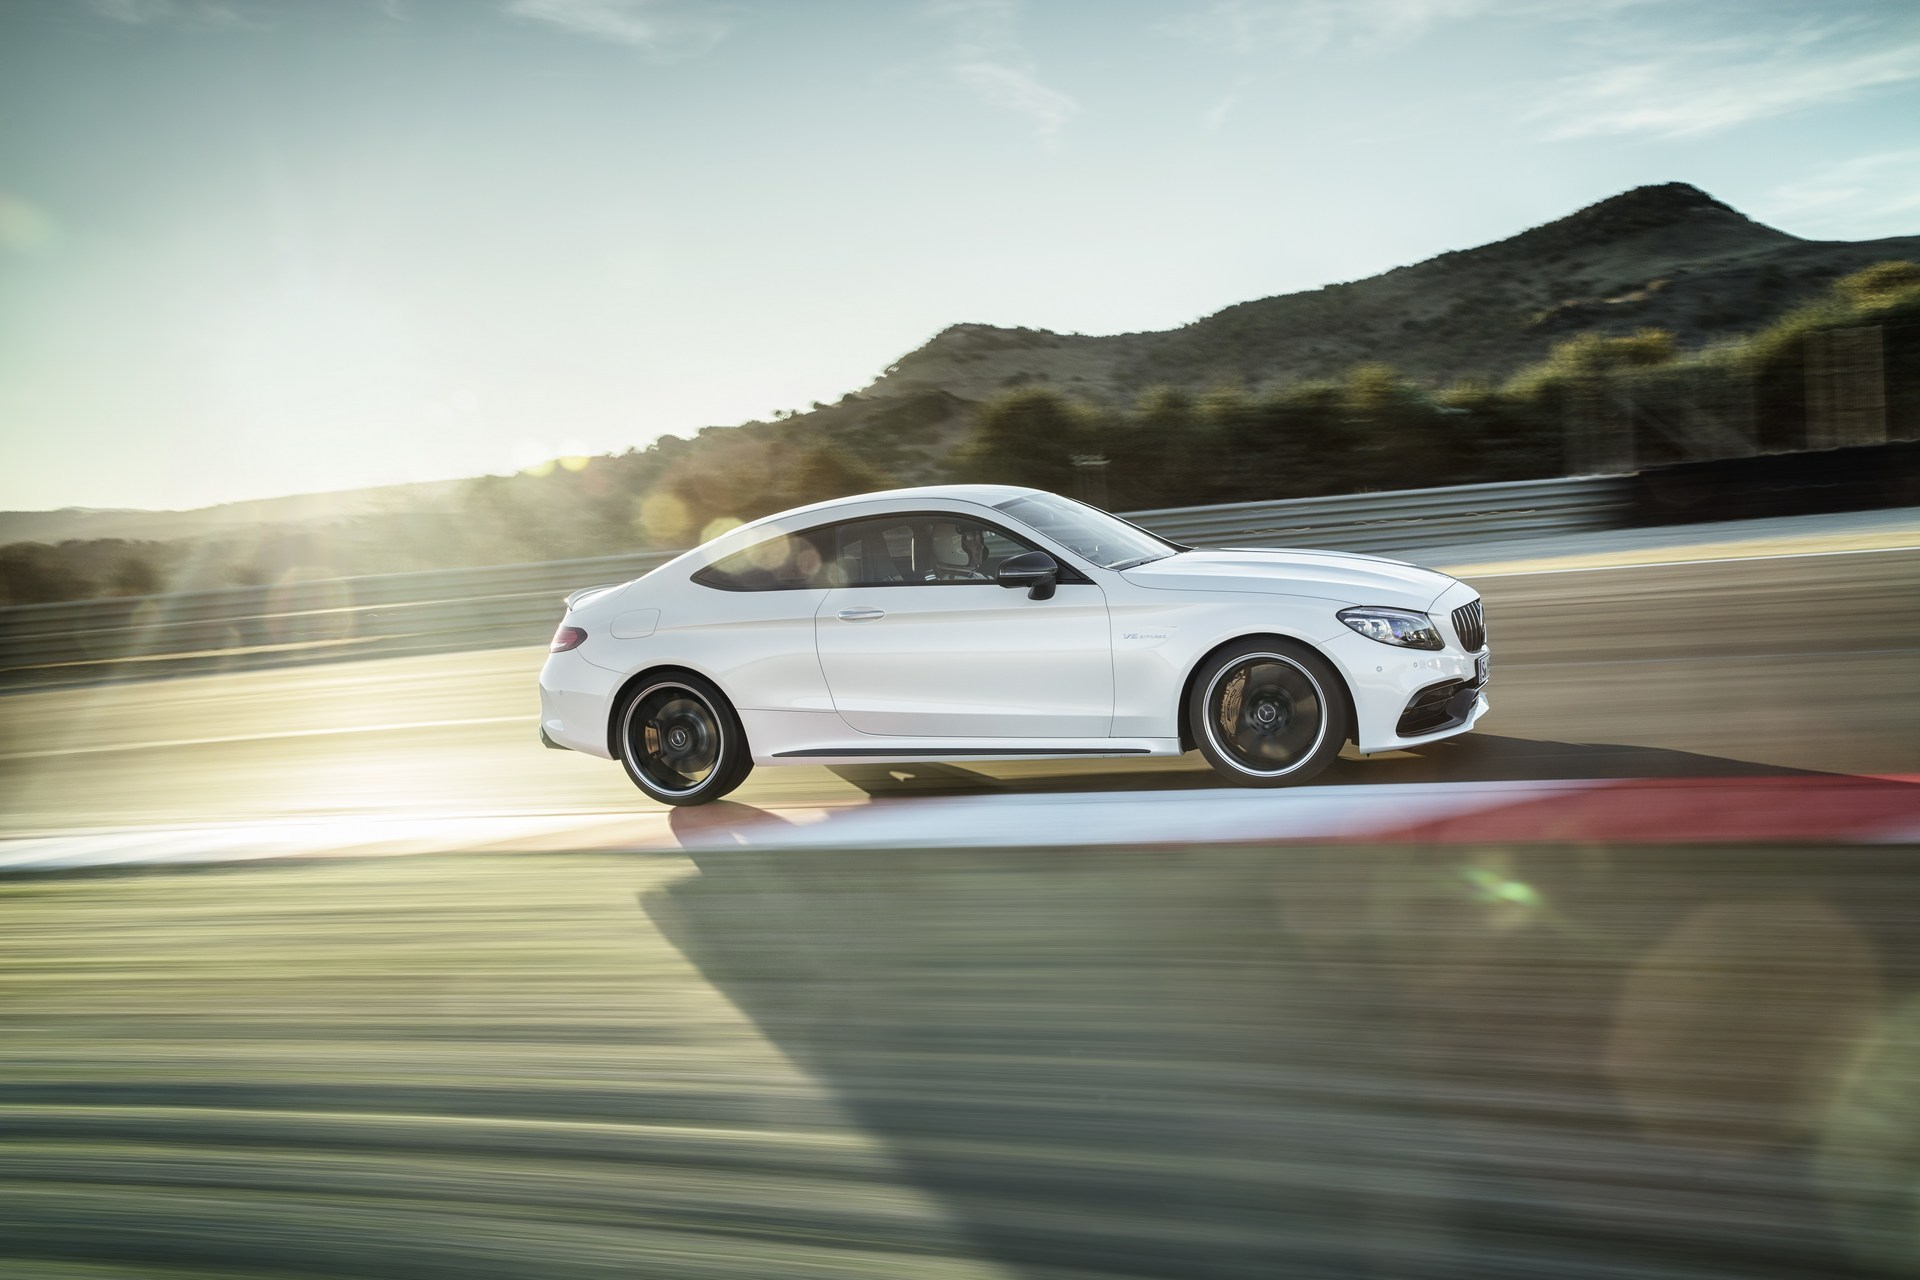 Mercedes-AMG-C63-Coupe-7.jpg